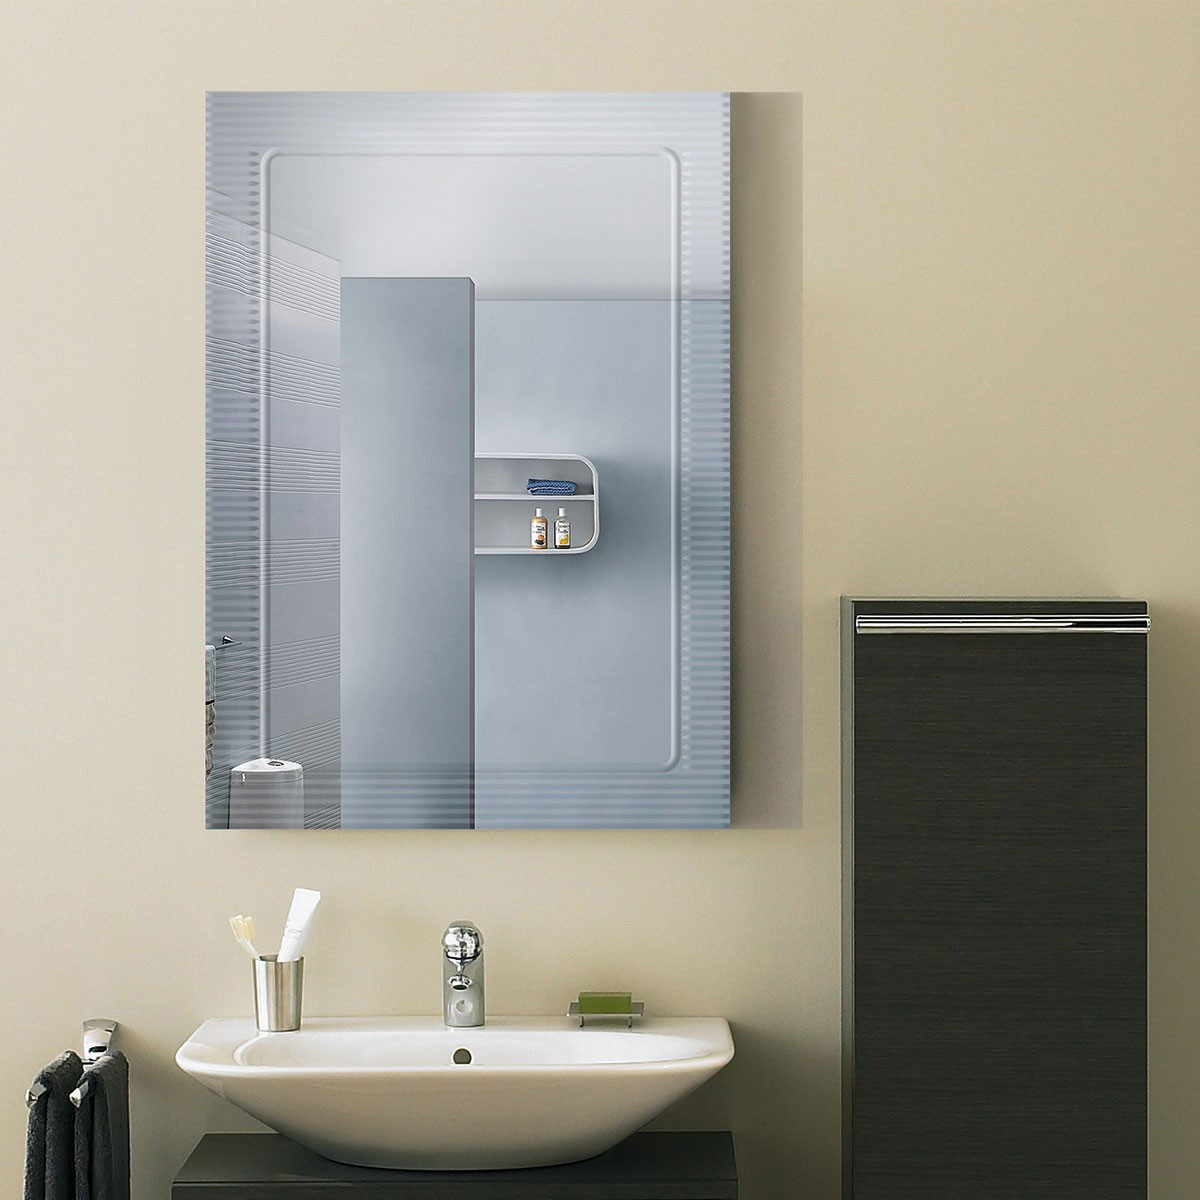 28 X 20 In Wall Mounted Rectangle Bathroom Mirror DK OD